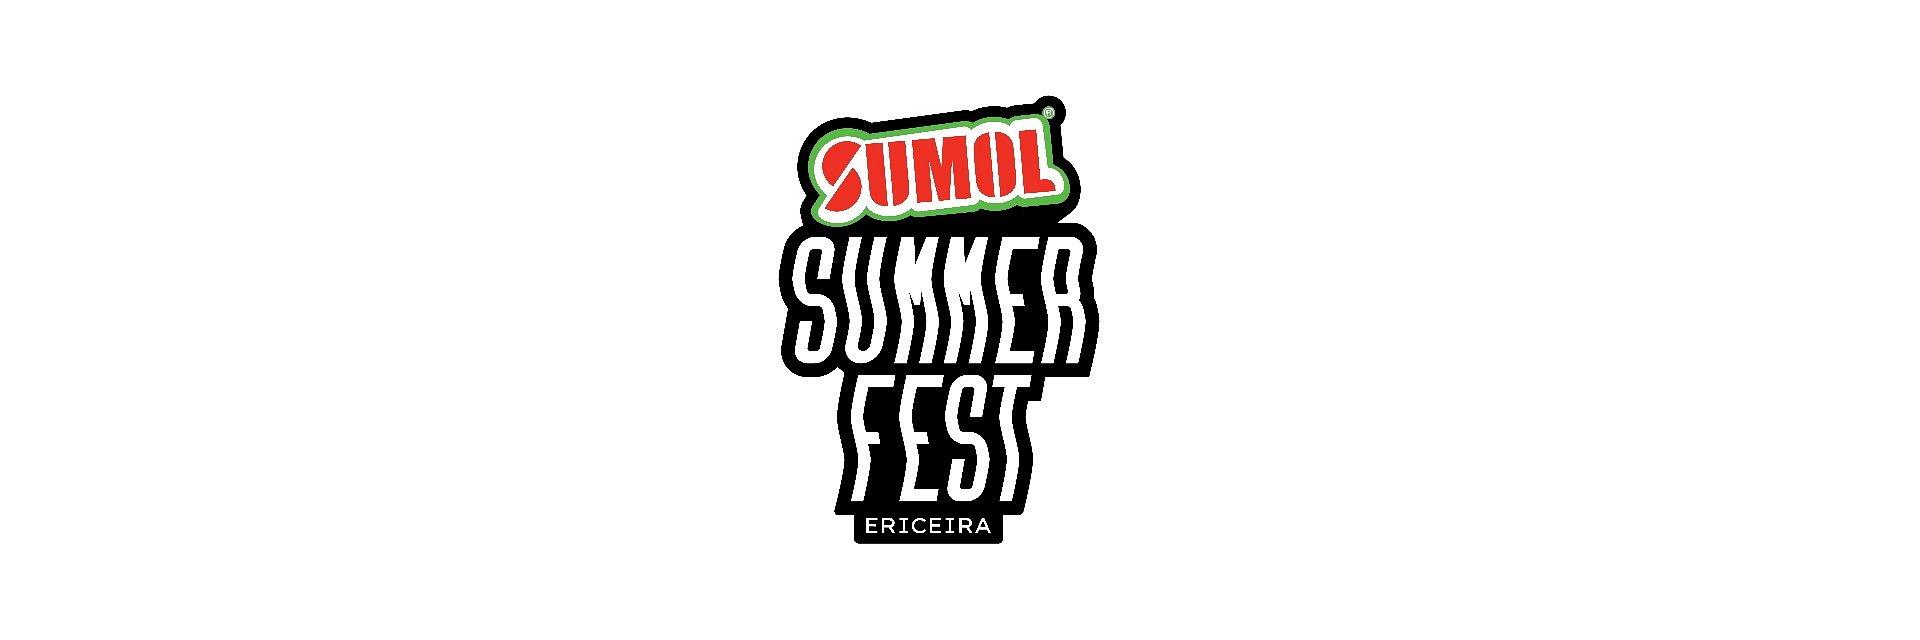 Sumol Summer Fest| Primeira confirmação:TRIPPIE REDD